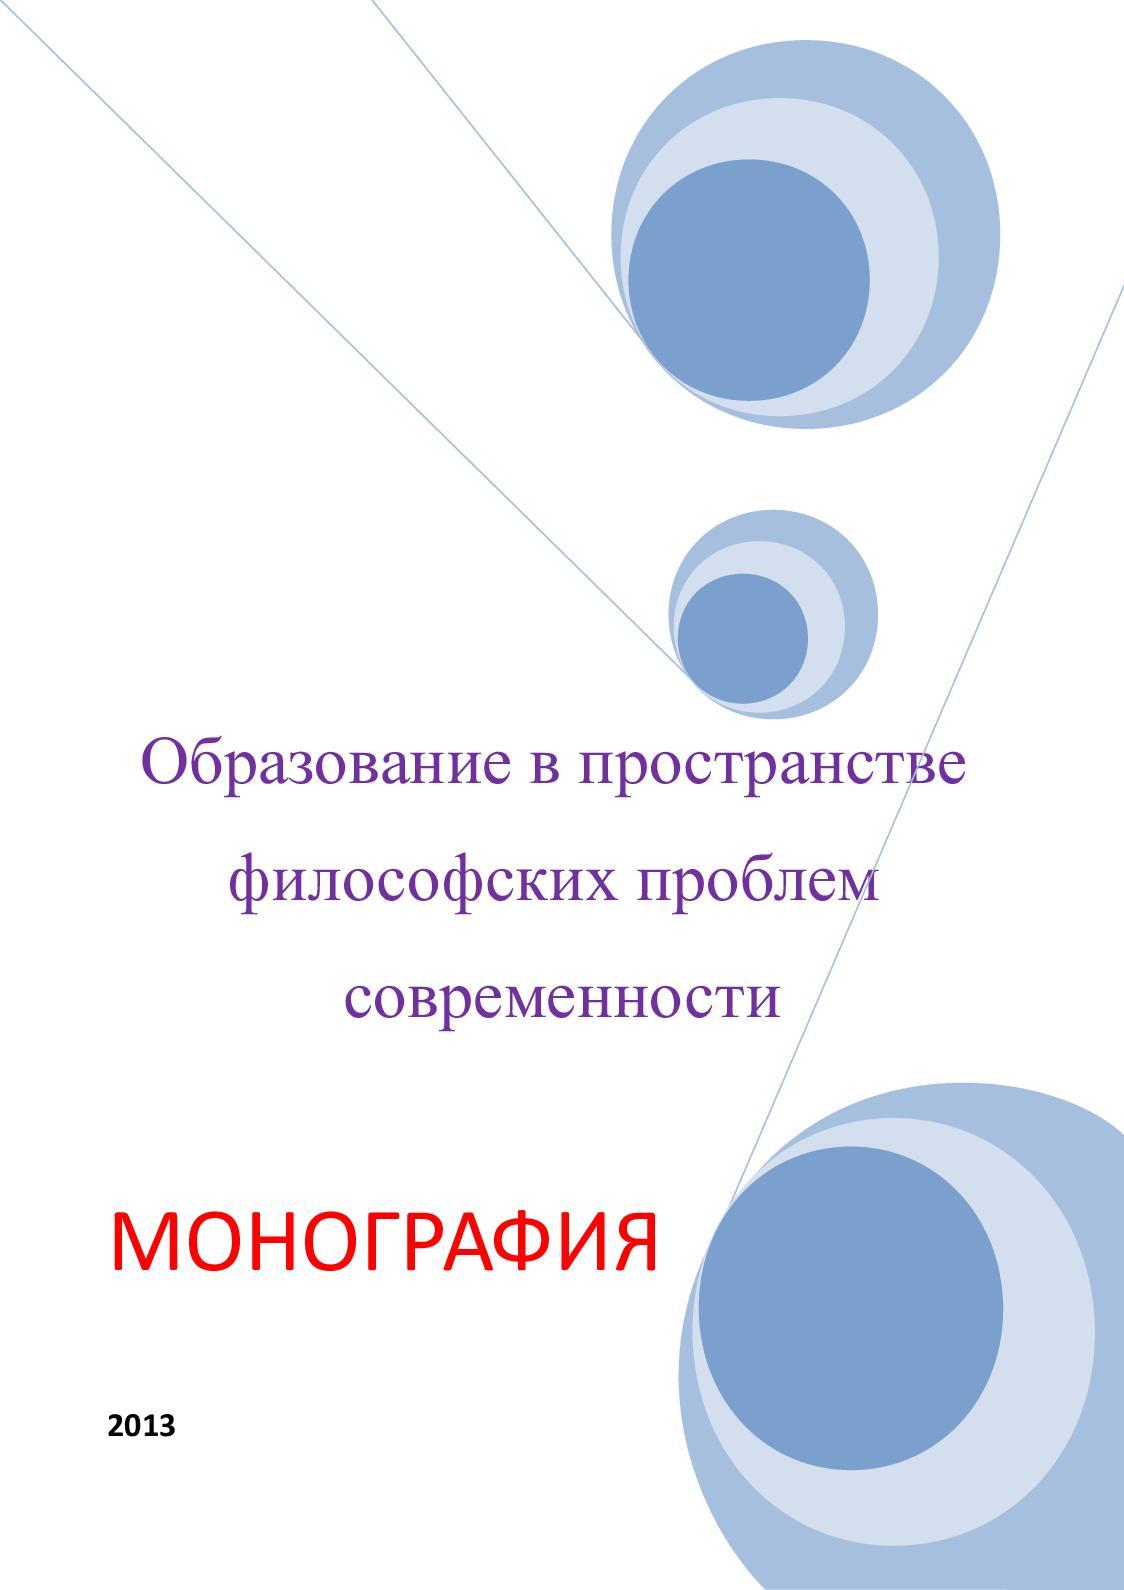 Субстрат (химия) - substrate (chemistry)